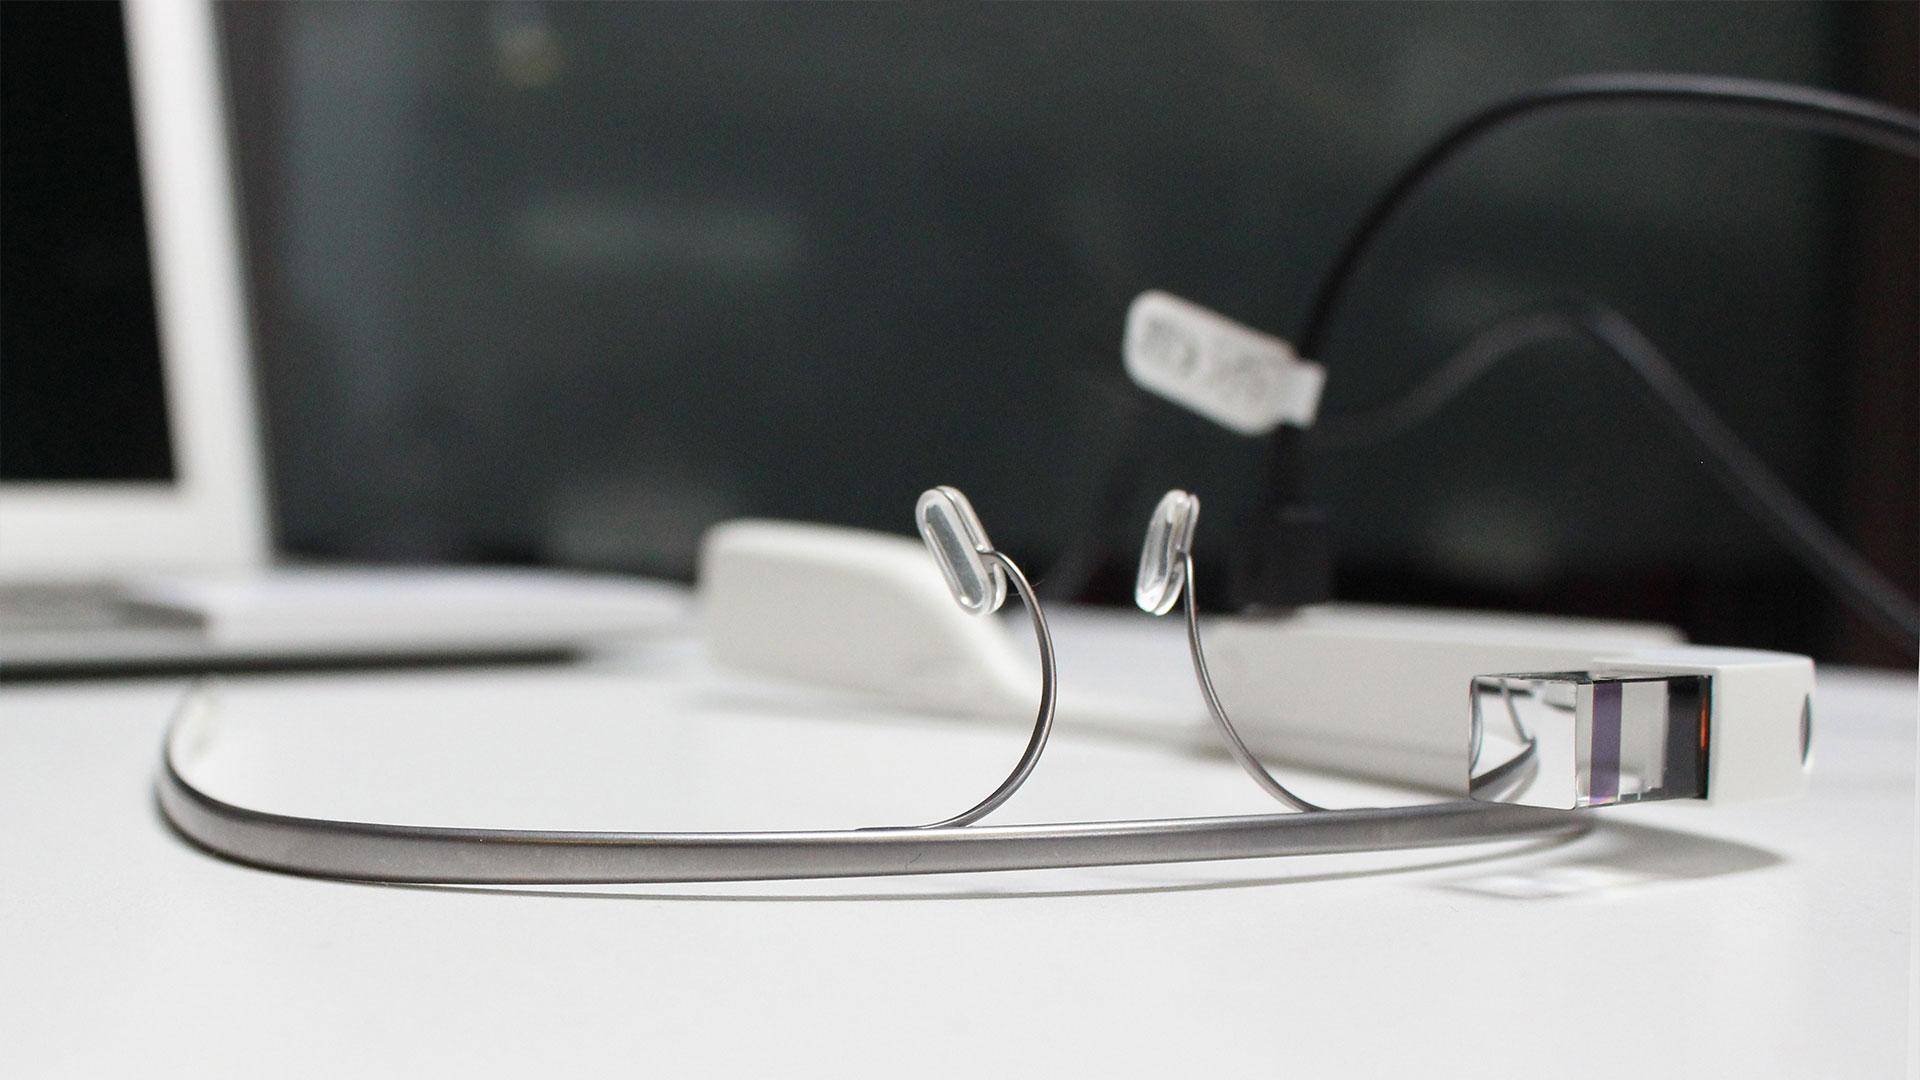 tpnet-eventos-encuentros-profesionales-iot-google-glasses